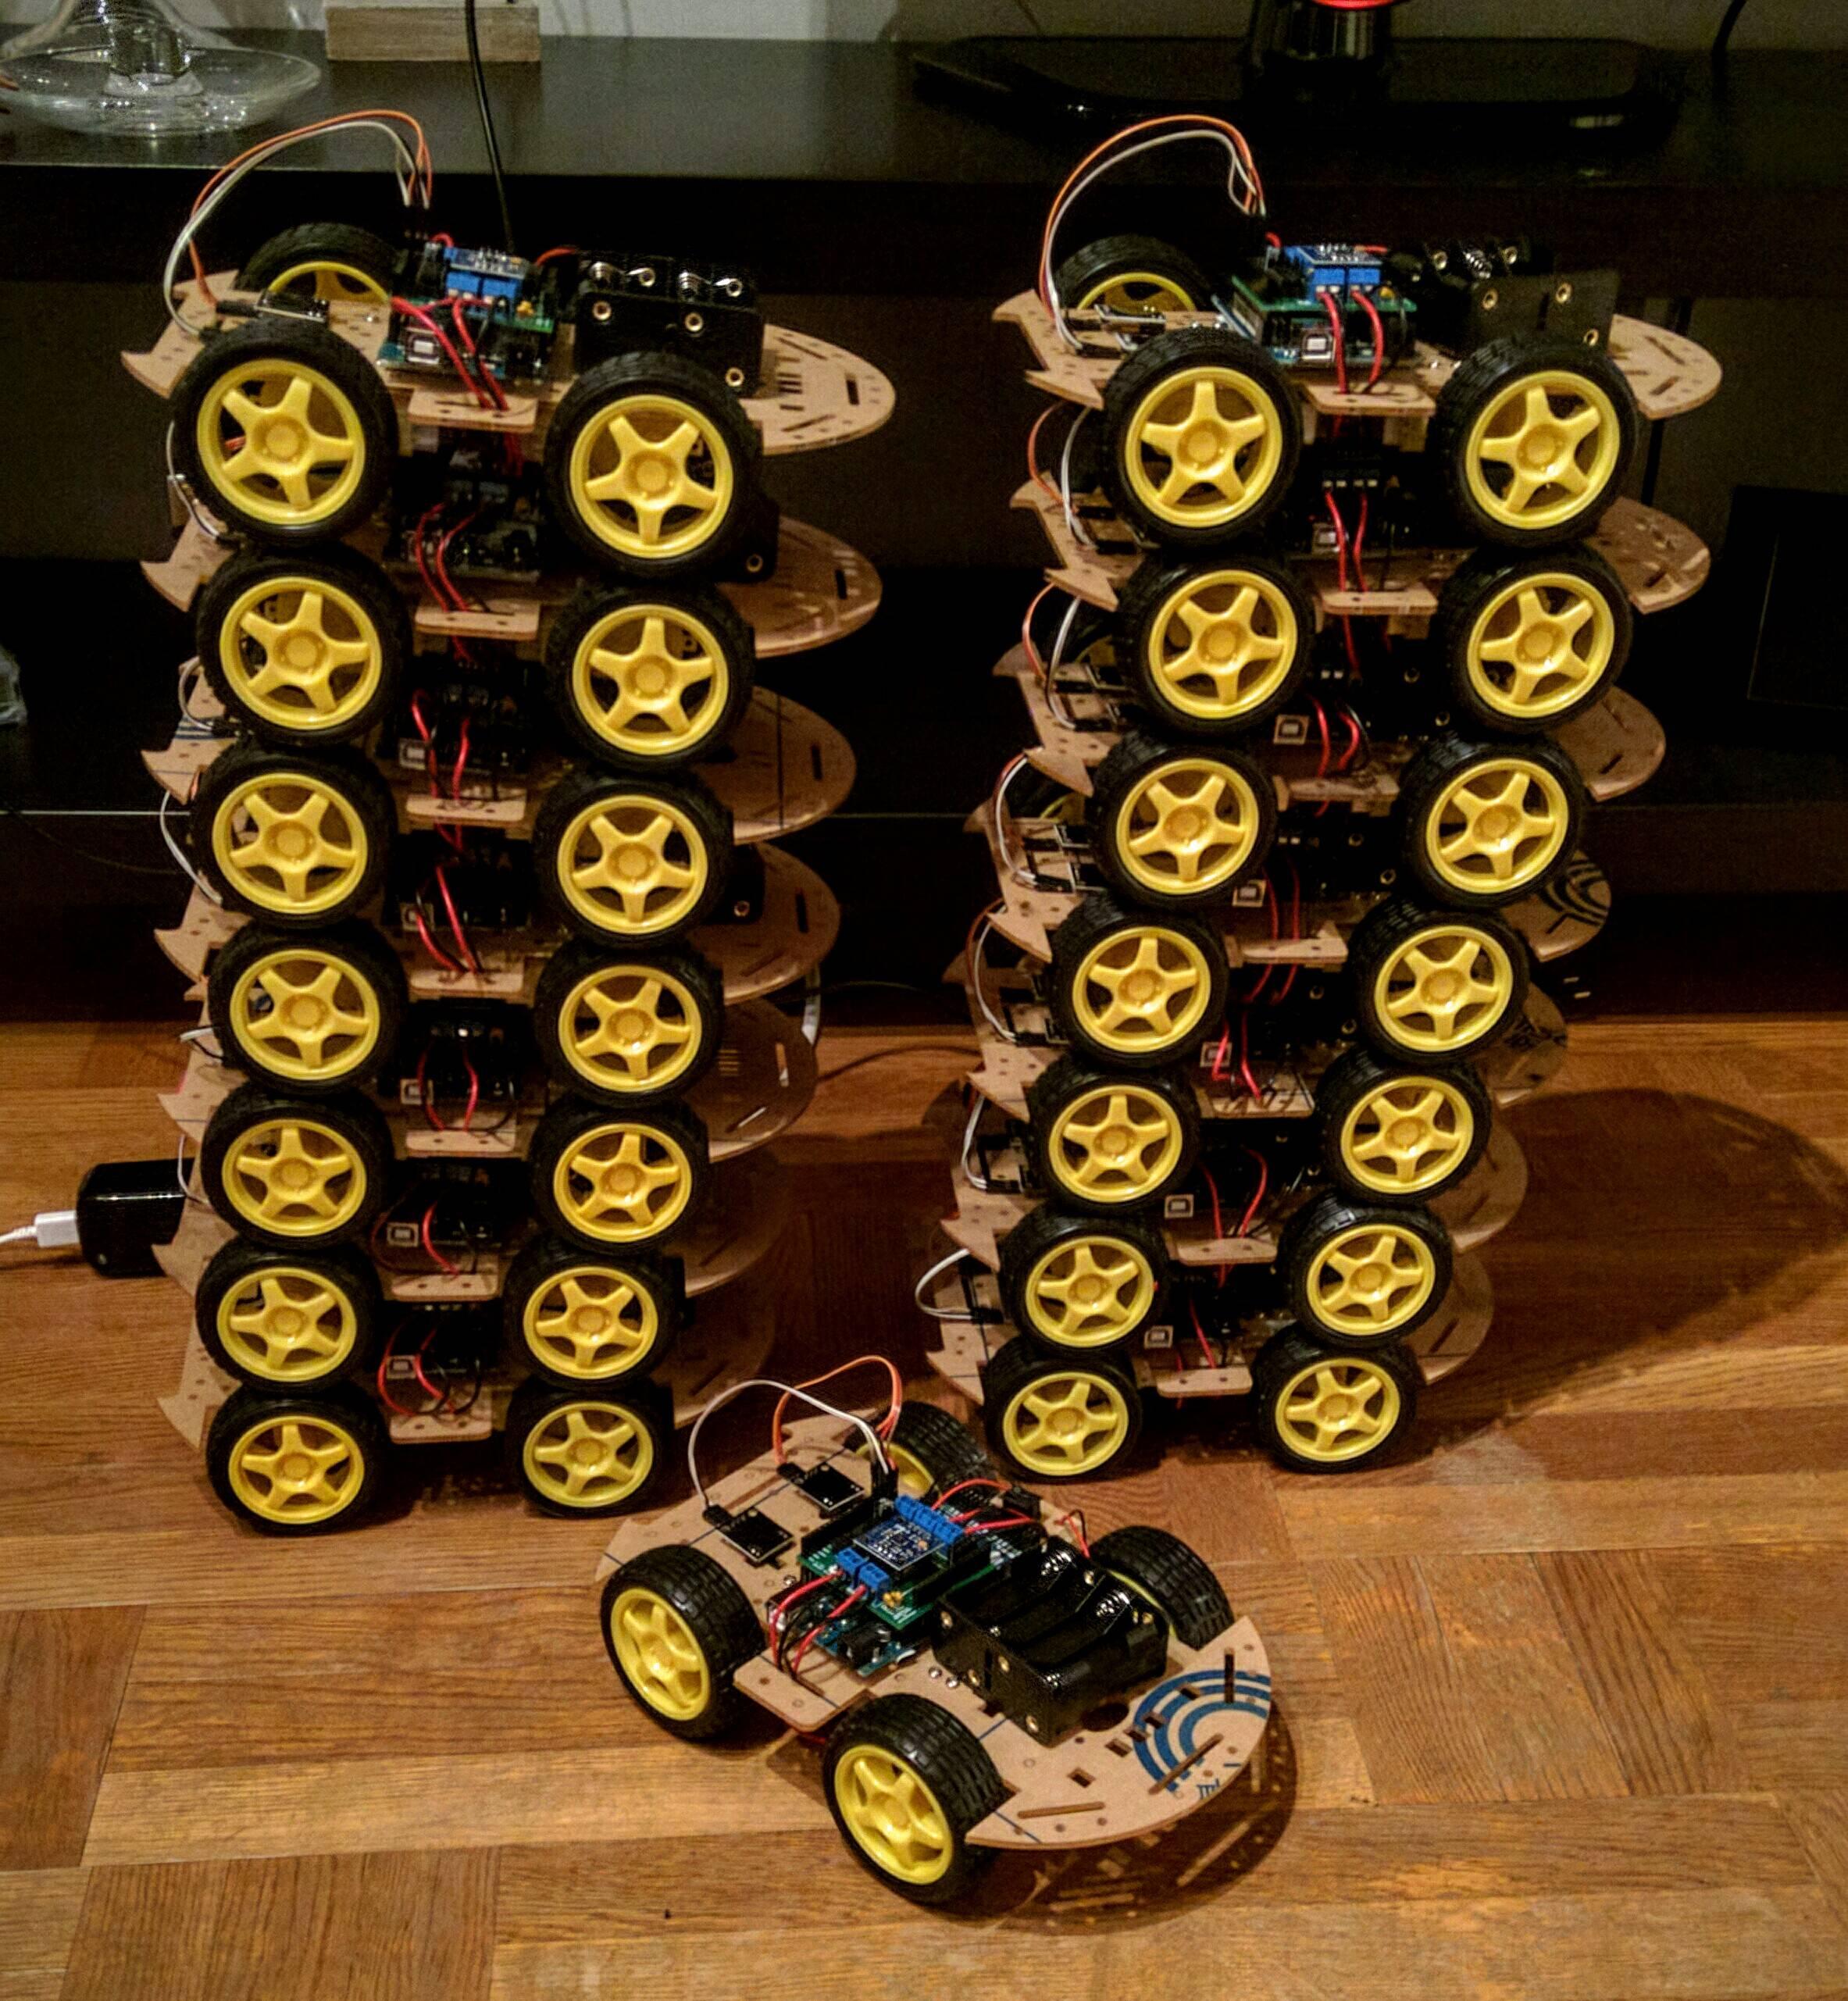 Smartcar stack